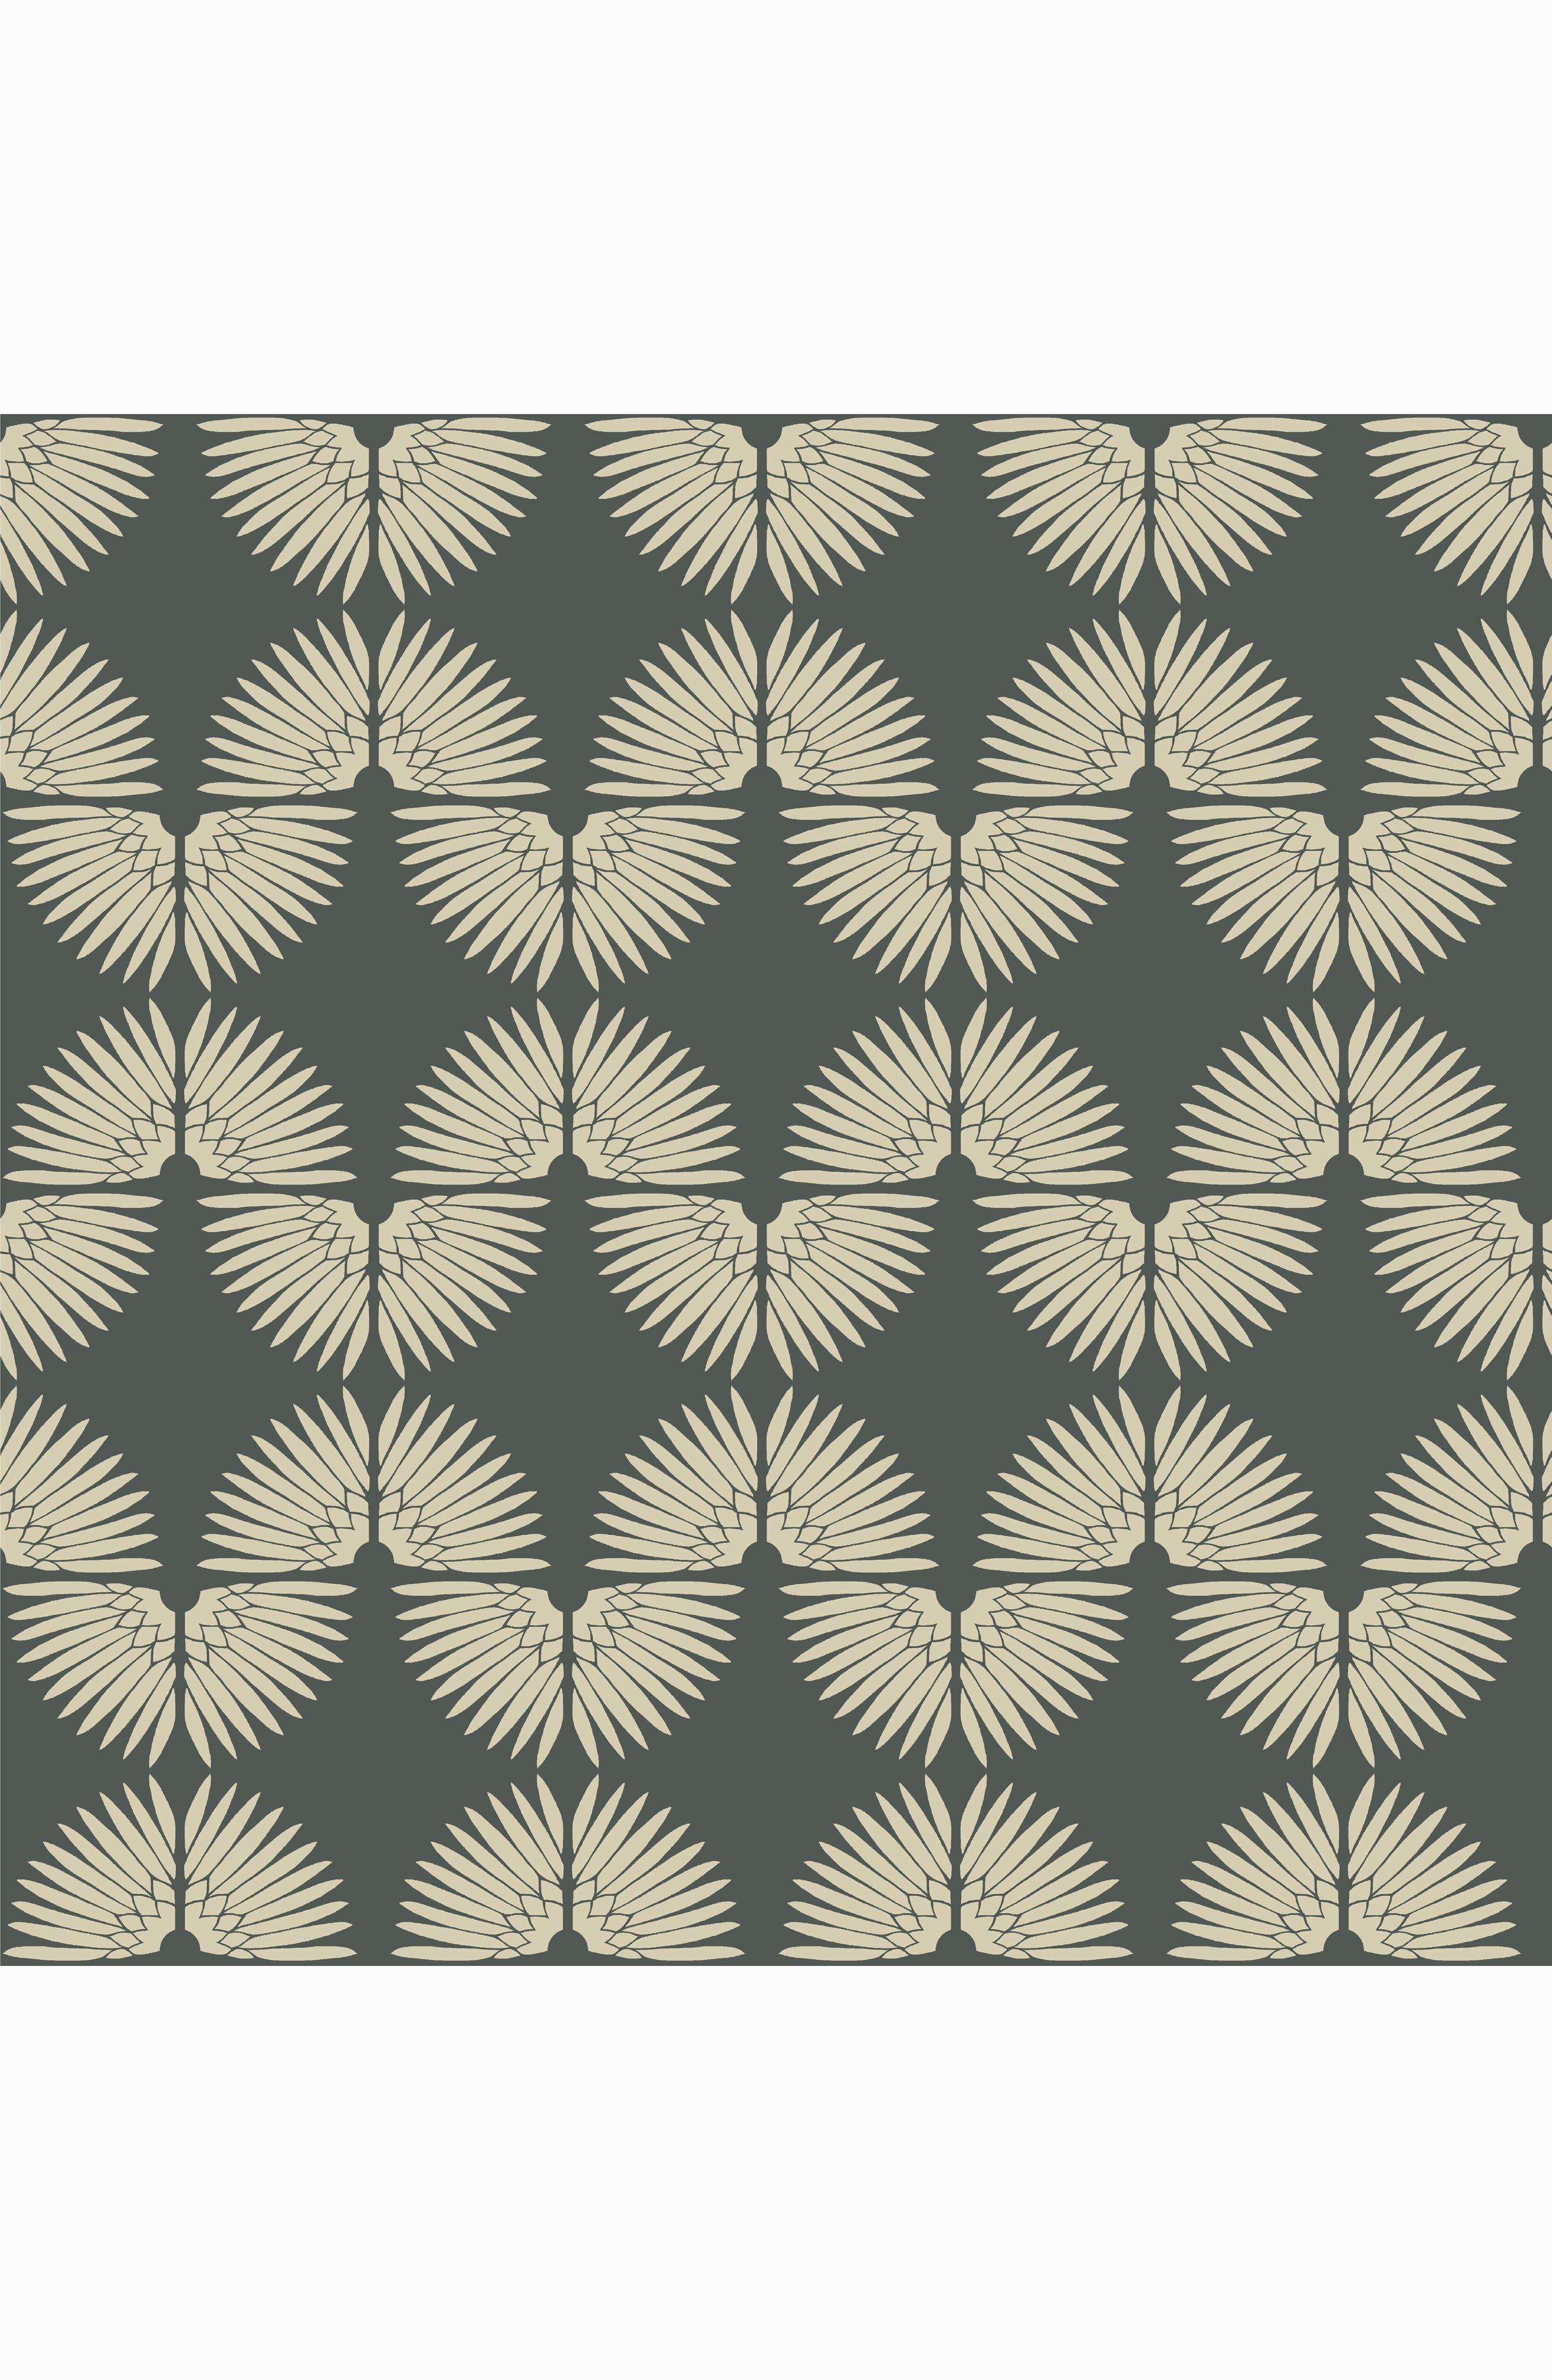 Urban Caterpillar Self-Adhesive Vinyl Wallpaper,                             Main thumbnail 1, color,                             300